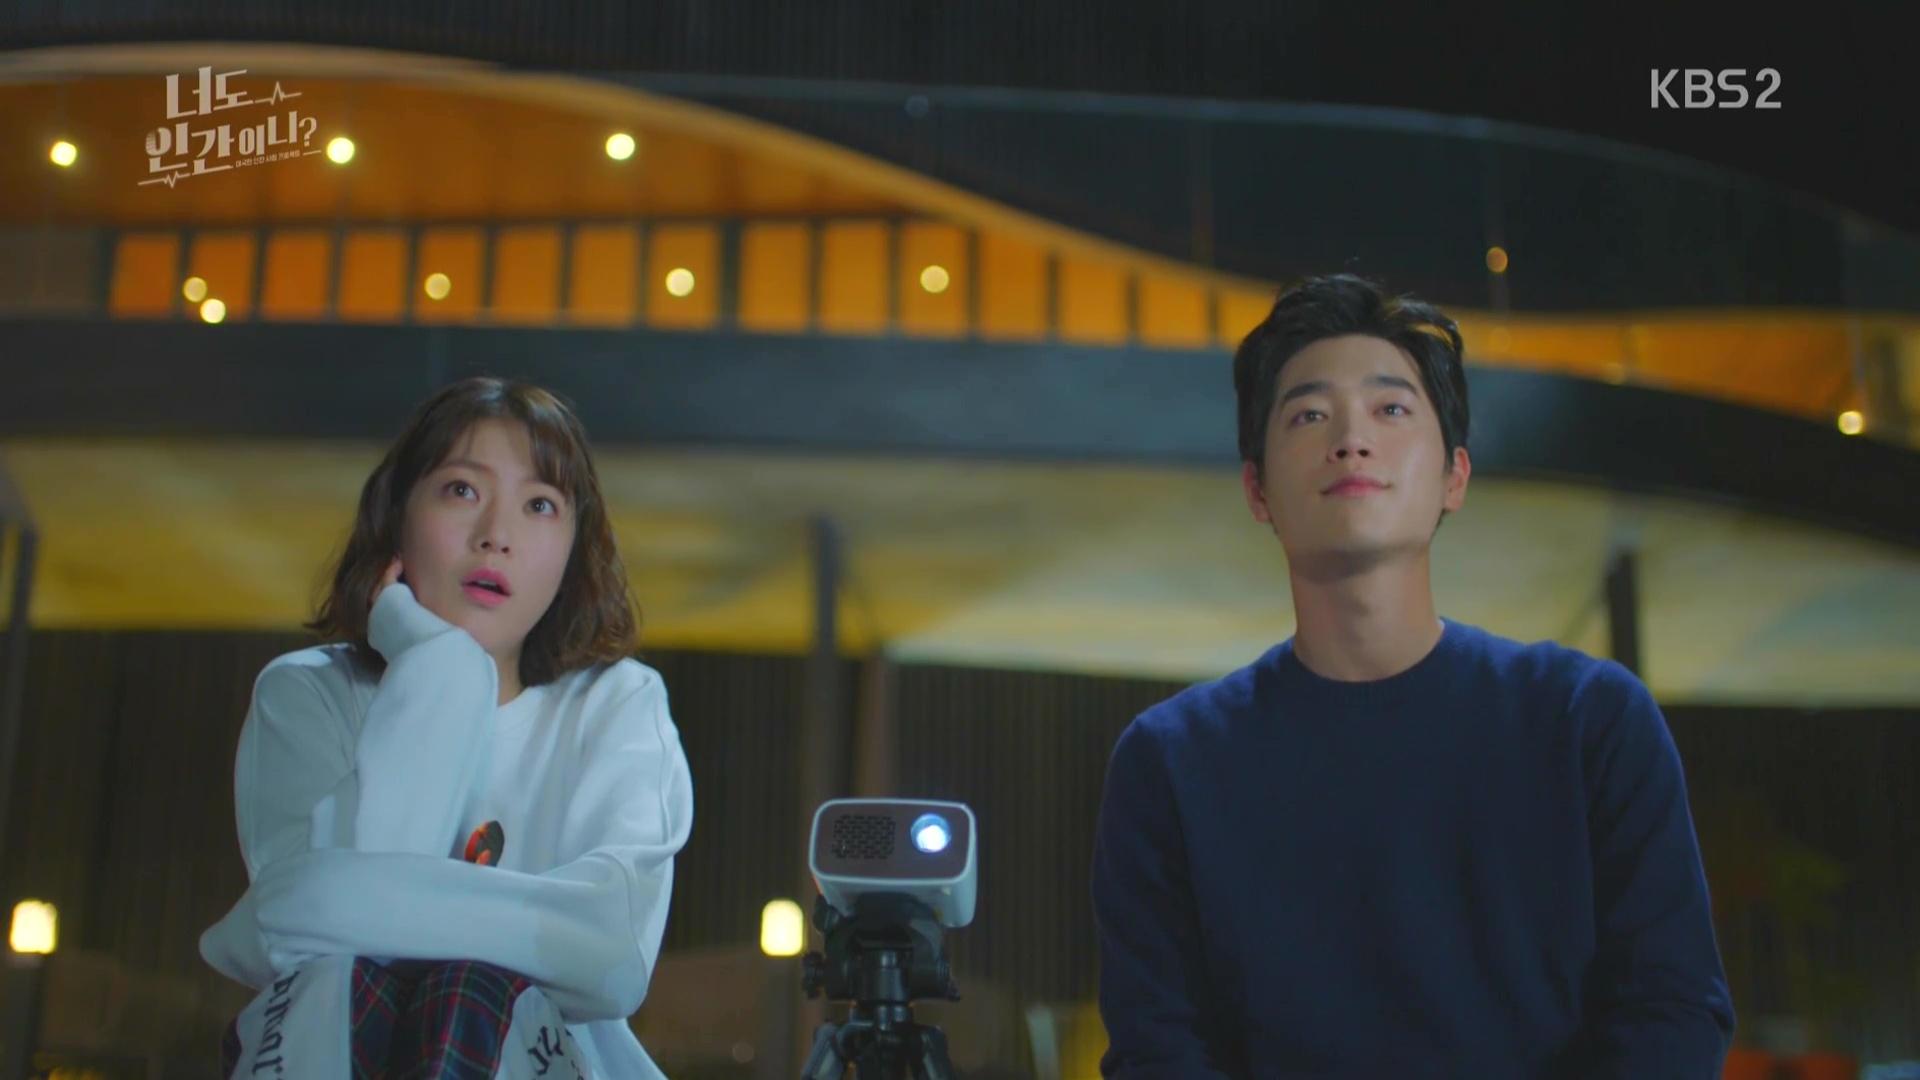 Rules of dating korean trailer